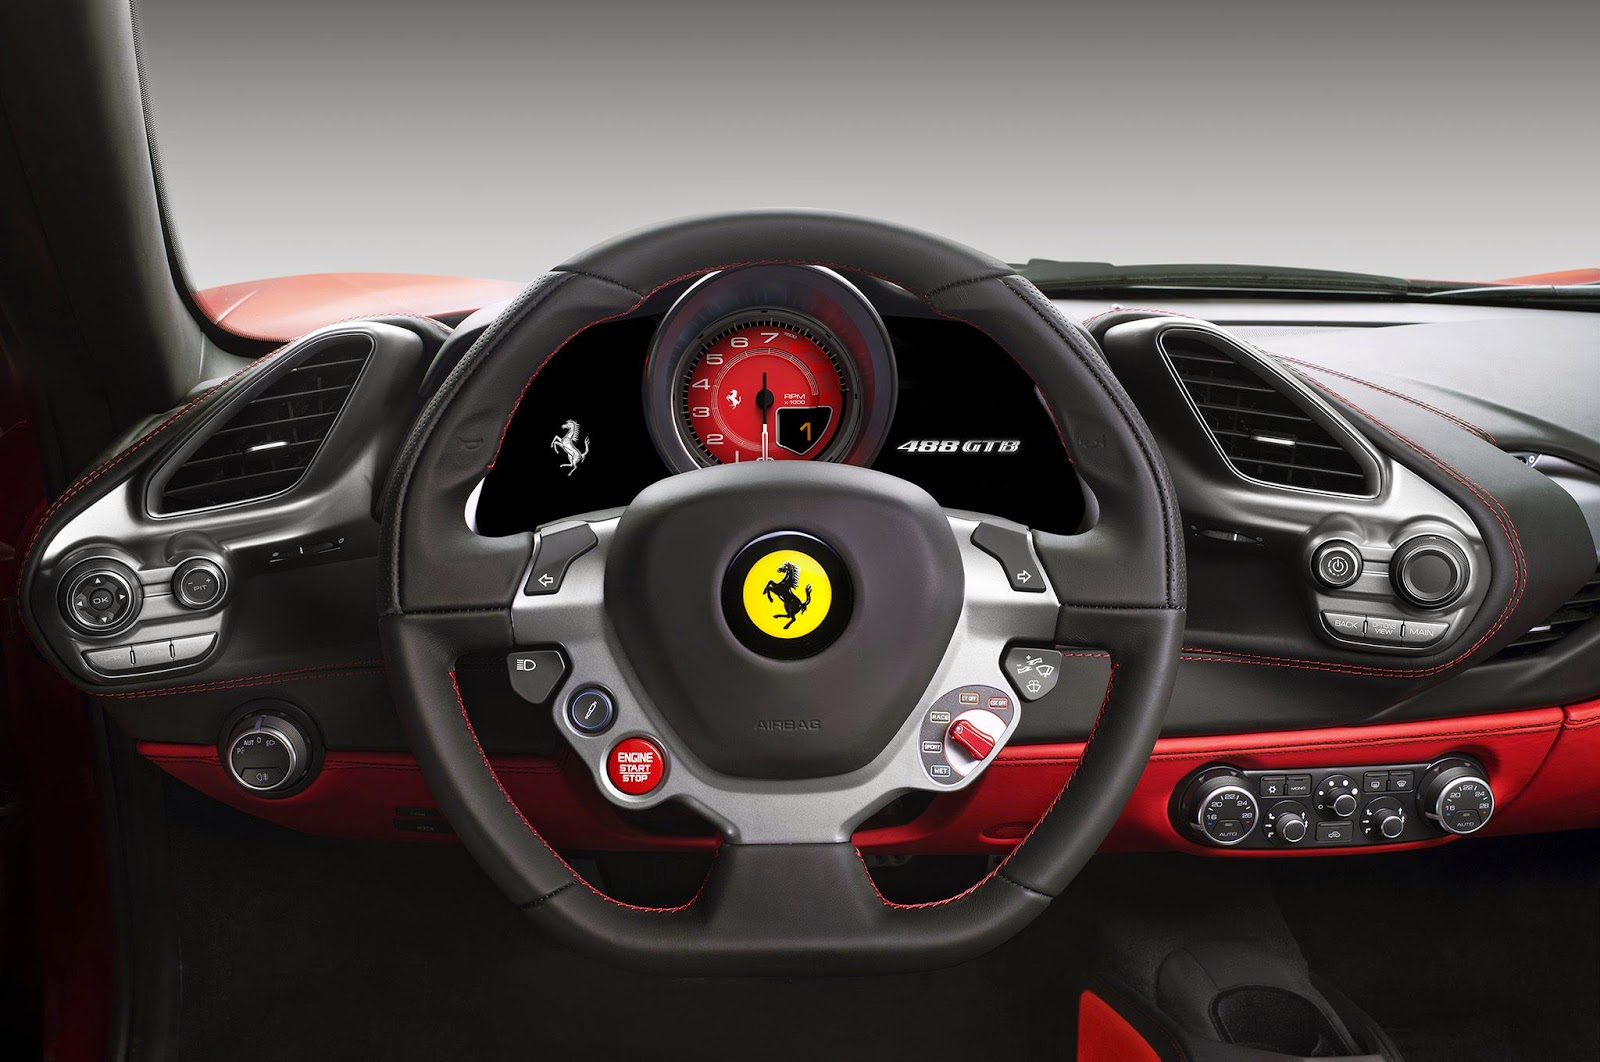 ferrari 488 gtb interior - Ferrari 2014 Enzo Interior